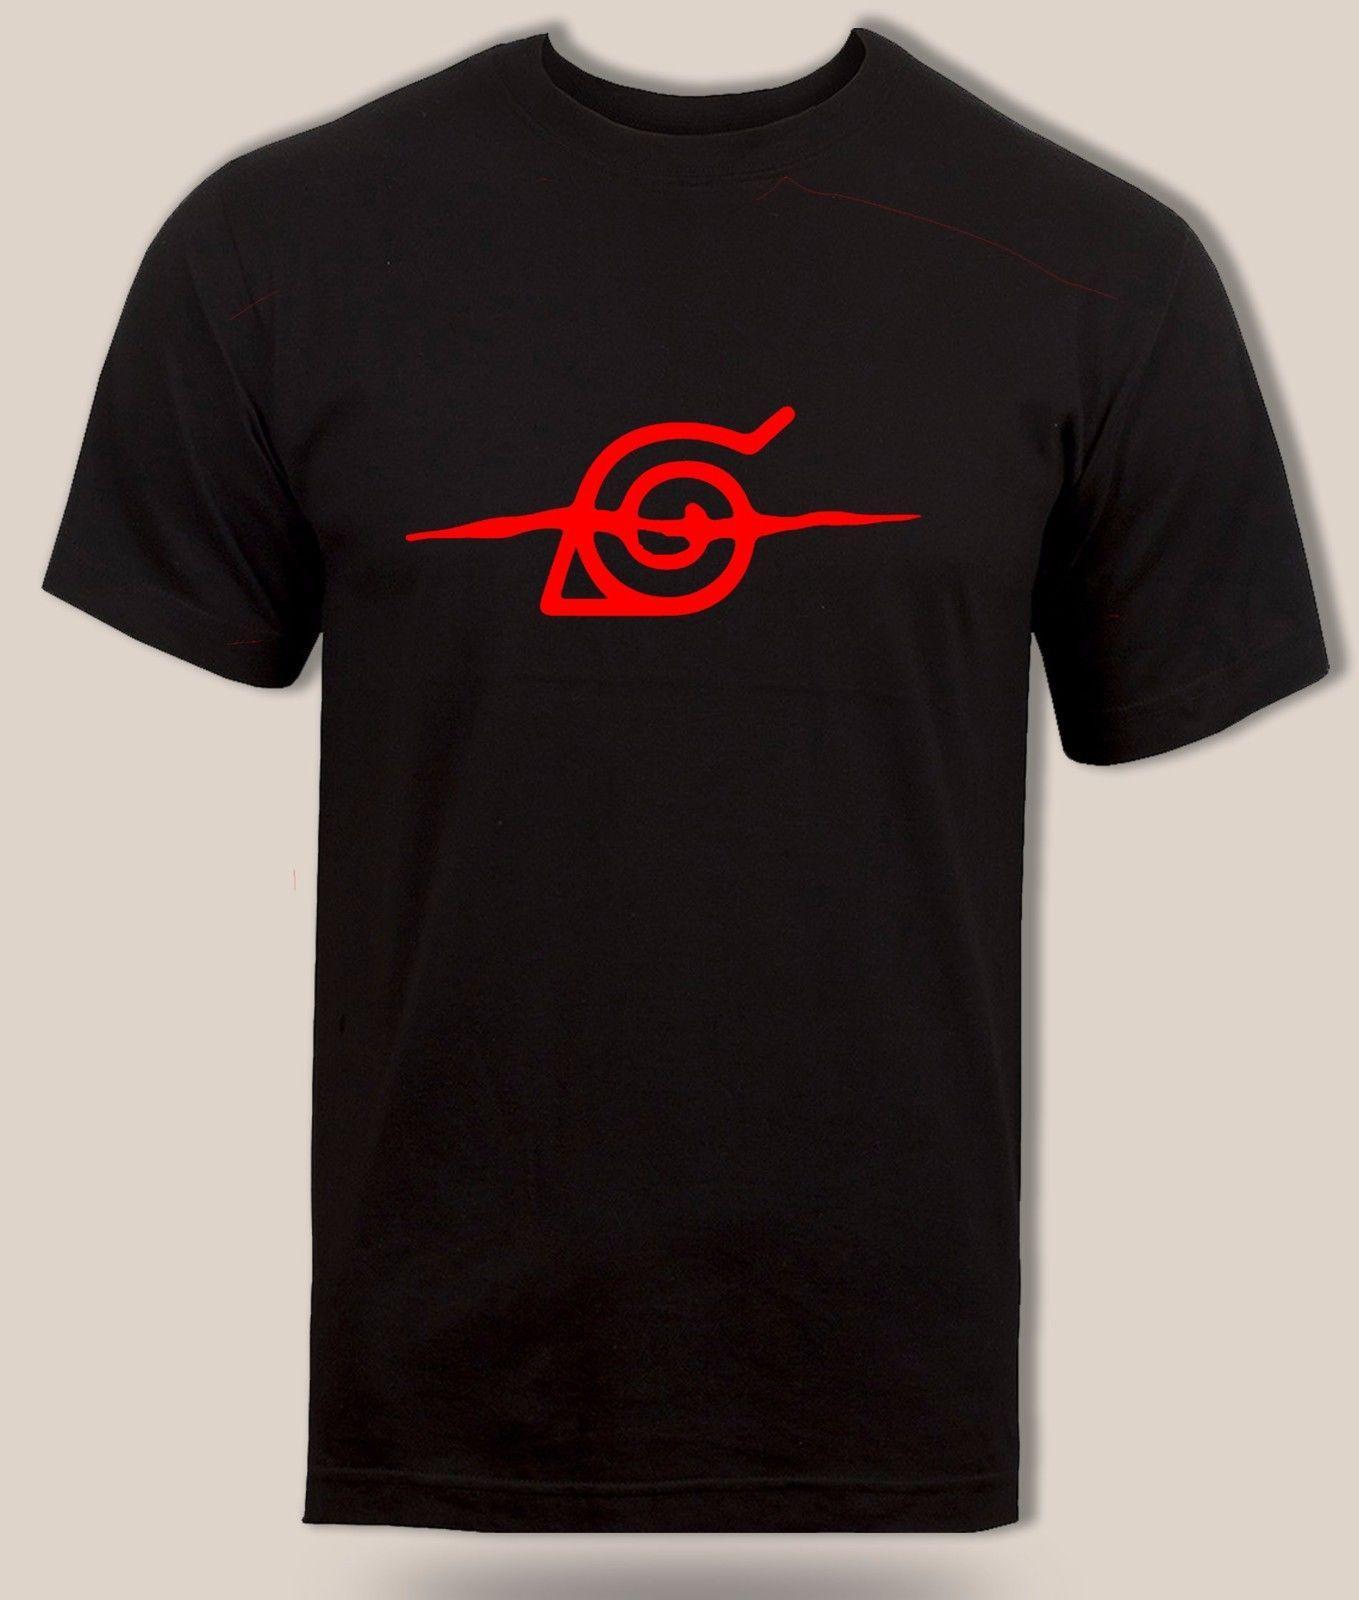 3e5b52462 Konoha Headband T Shirt, Uchiha Sasuke Itachi Boruto Ninja Top, Naruto  Anime Tee Funny Unisex Tee Shirt And Tshirt Create Your Own T Shirt Design  From ...